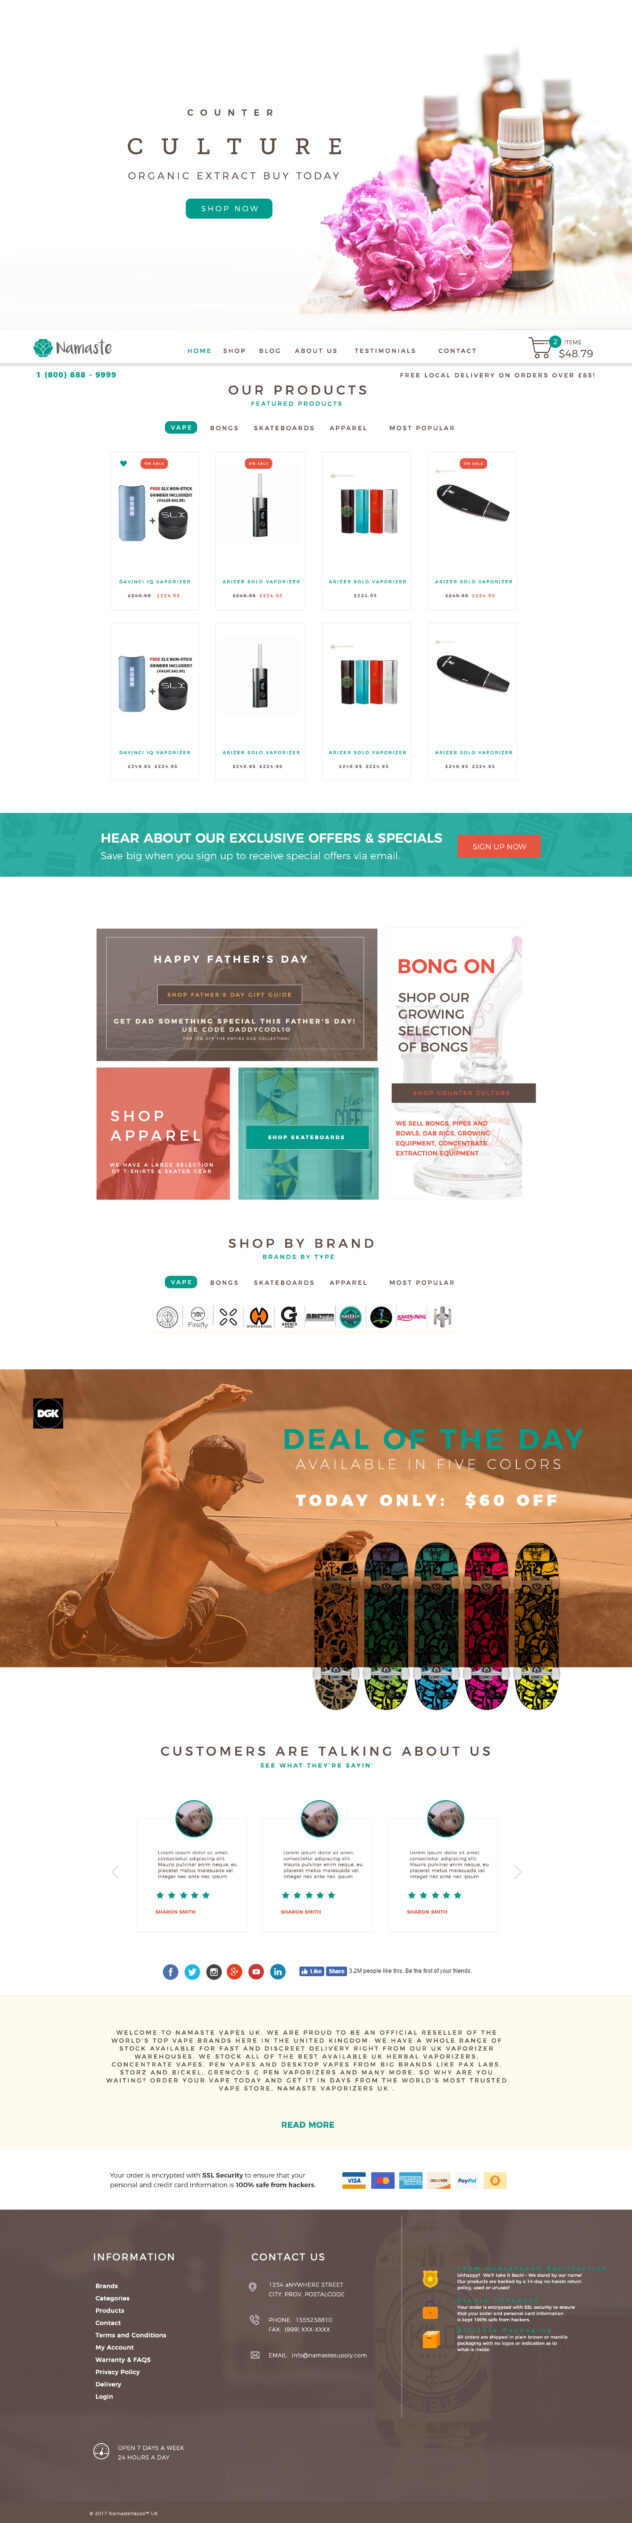 Custom website design for Namaste Cannibis supply ecommerce website.